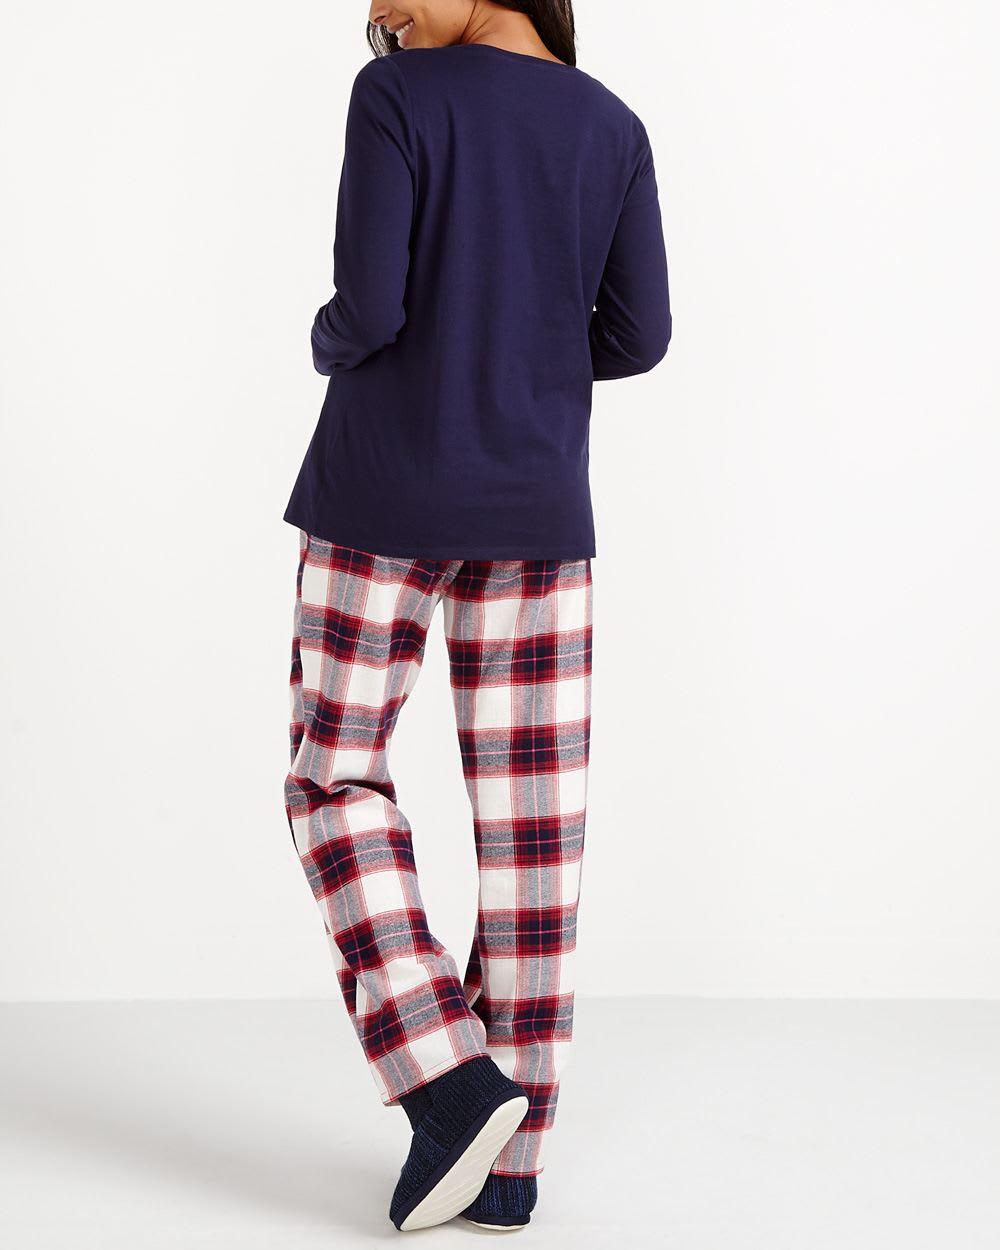 2af749b015 Winter Pyjama Set